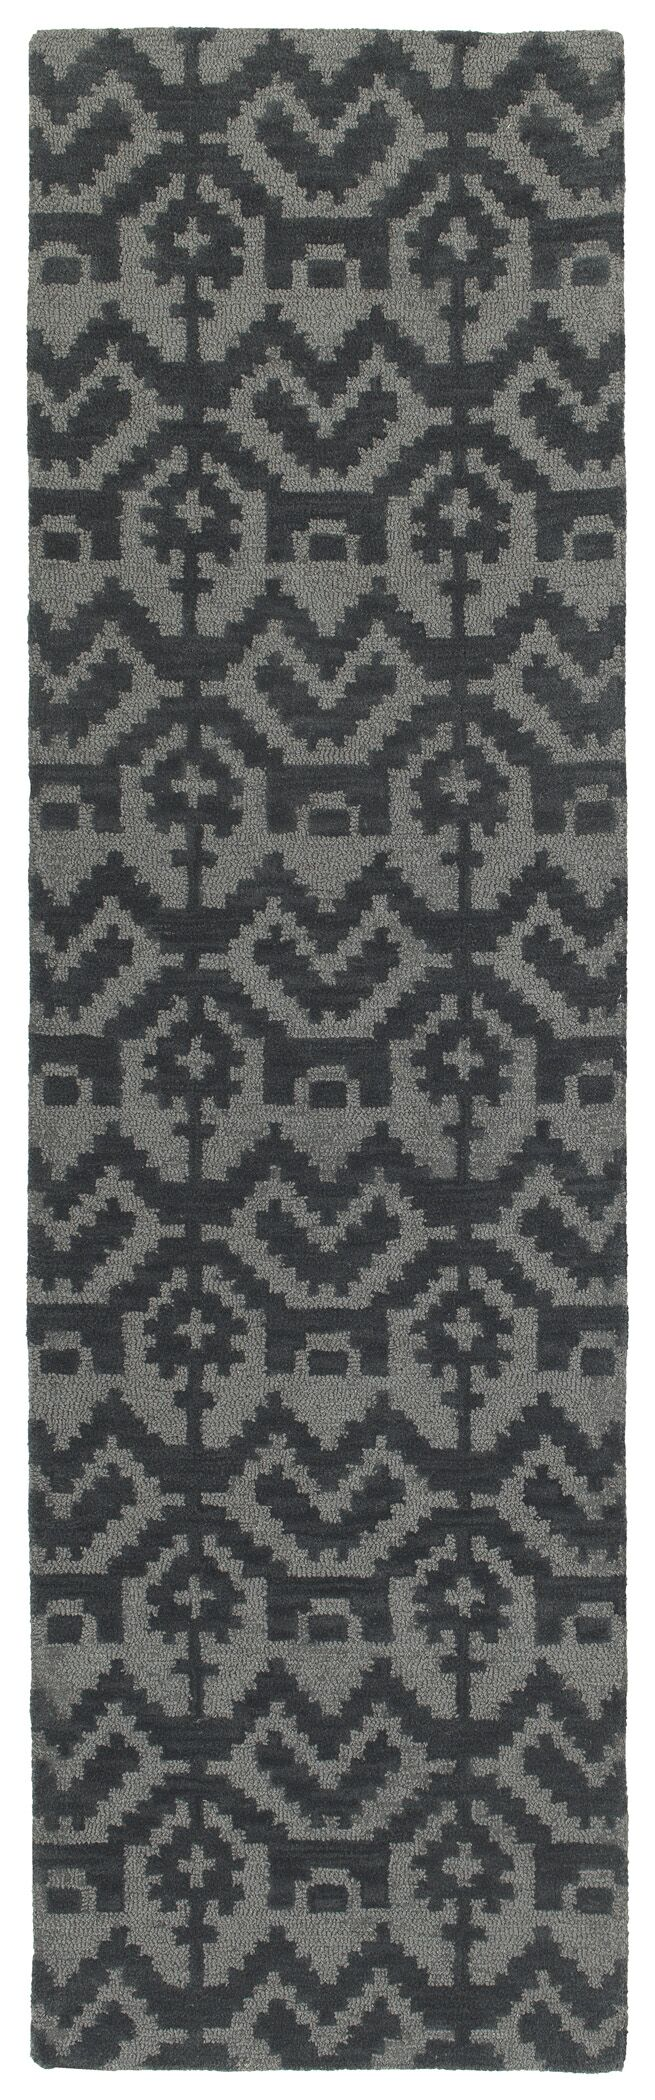 Hinton Charterhouse Hand-Tufted Gray Area Rug Rug Size: Runner 2'3